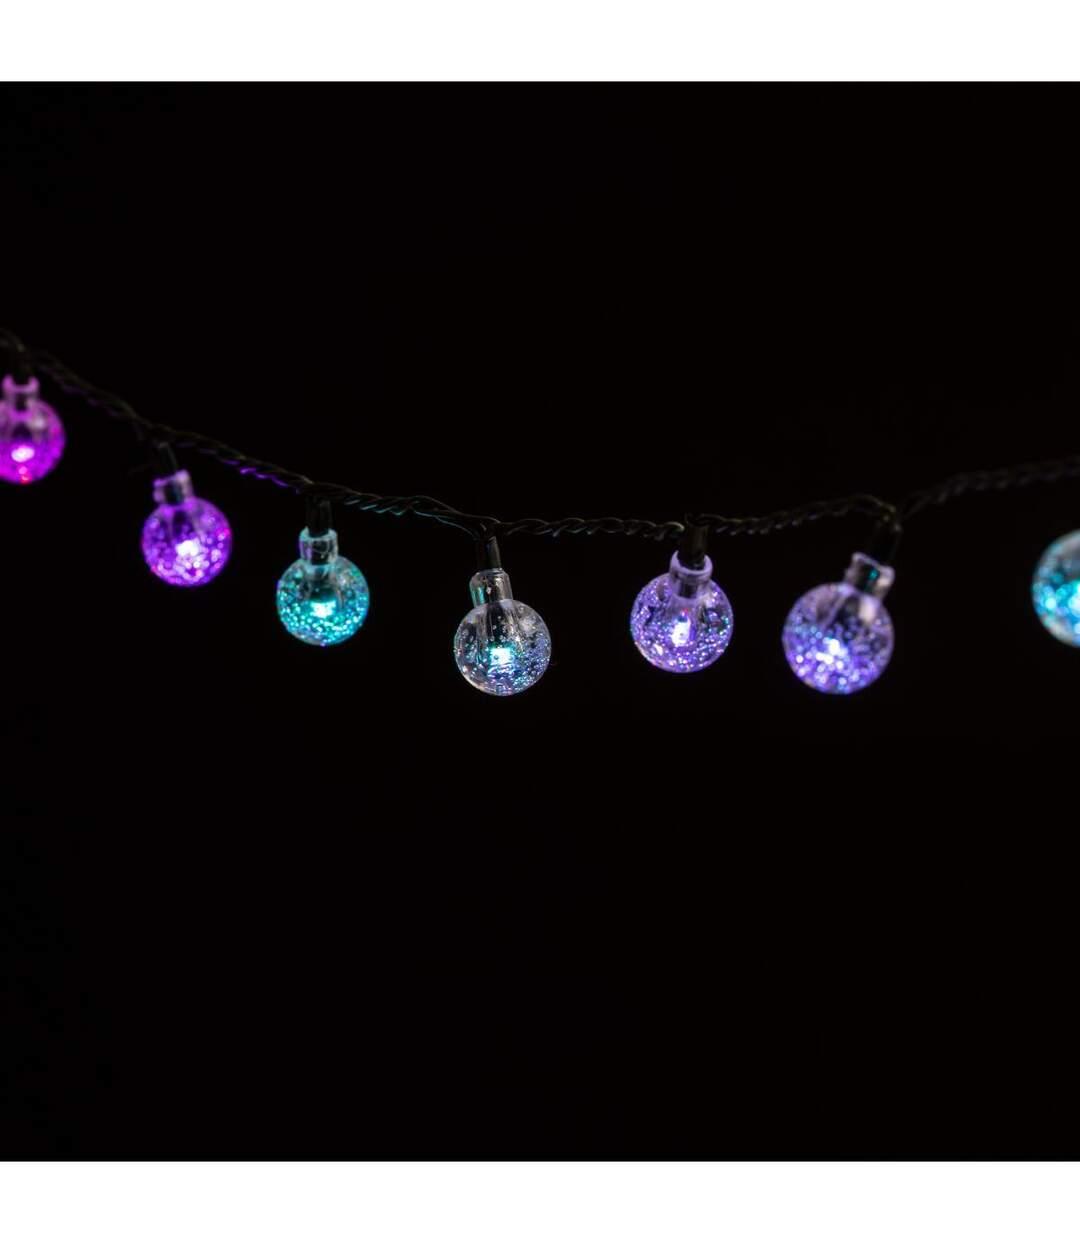 Feeric Christmas - Guirlande lumineuse Intérieur 100 LED sur 9.9 m